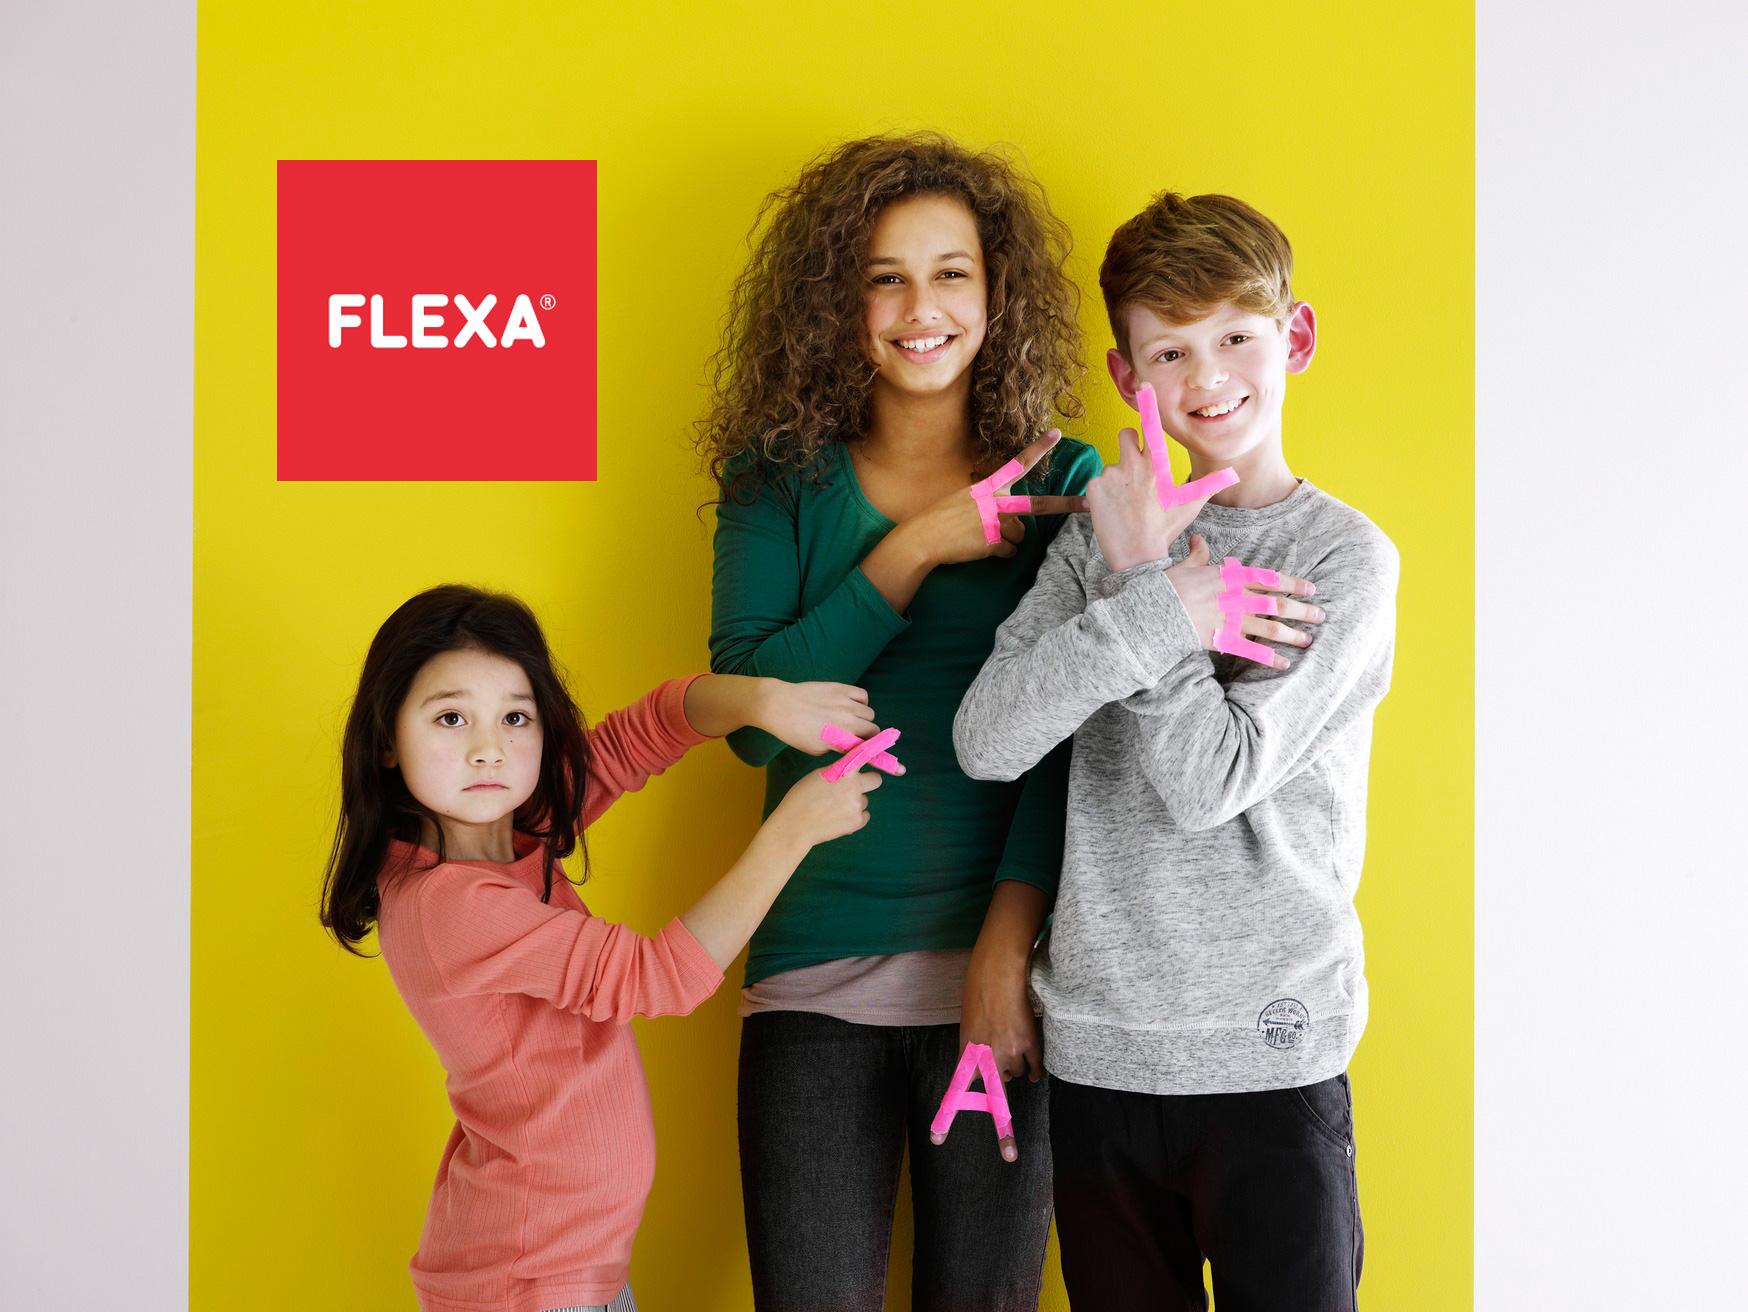 Zu Gast bei Flexa auf der IMM Cologne | hochbett-berater.de